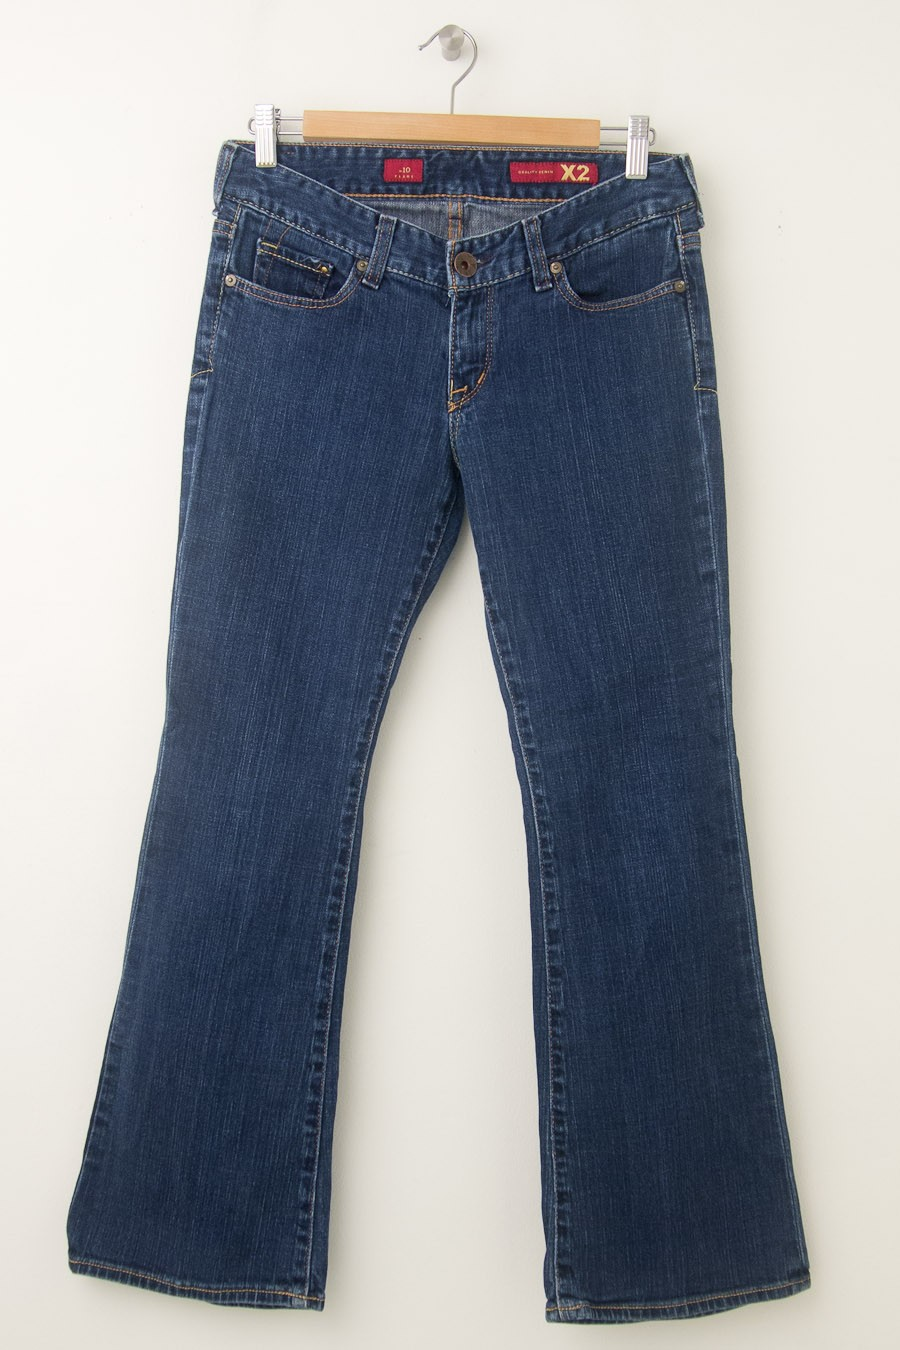 Express X2 W10 Flare Jeans Women S 4s Short